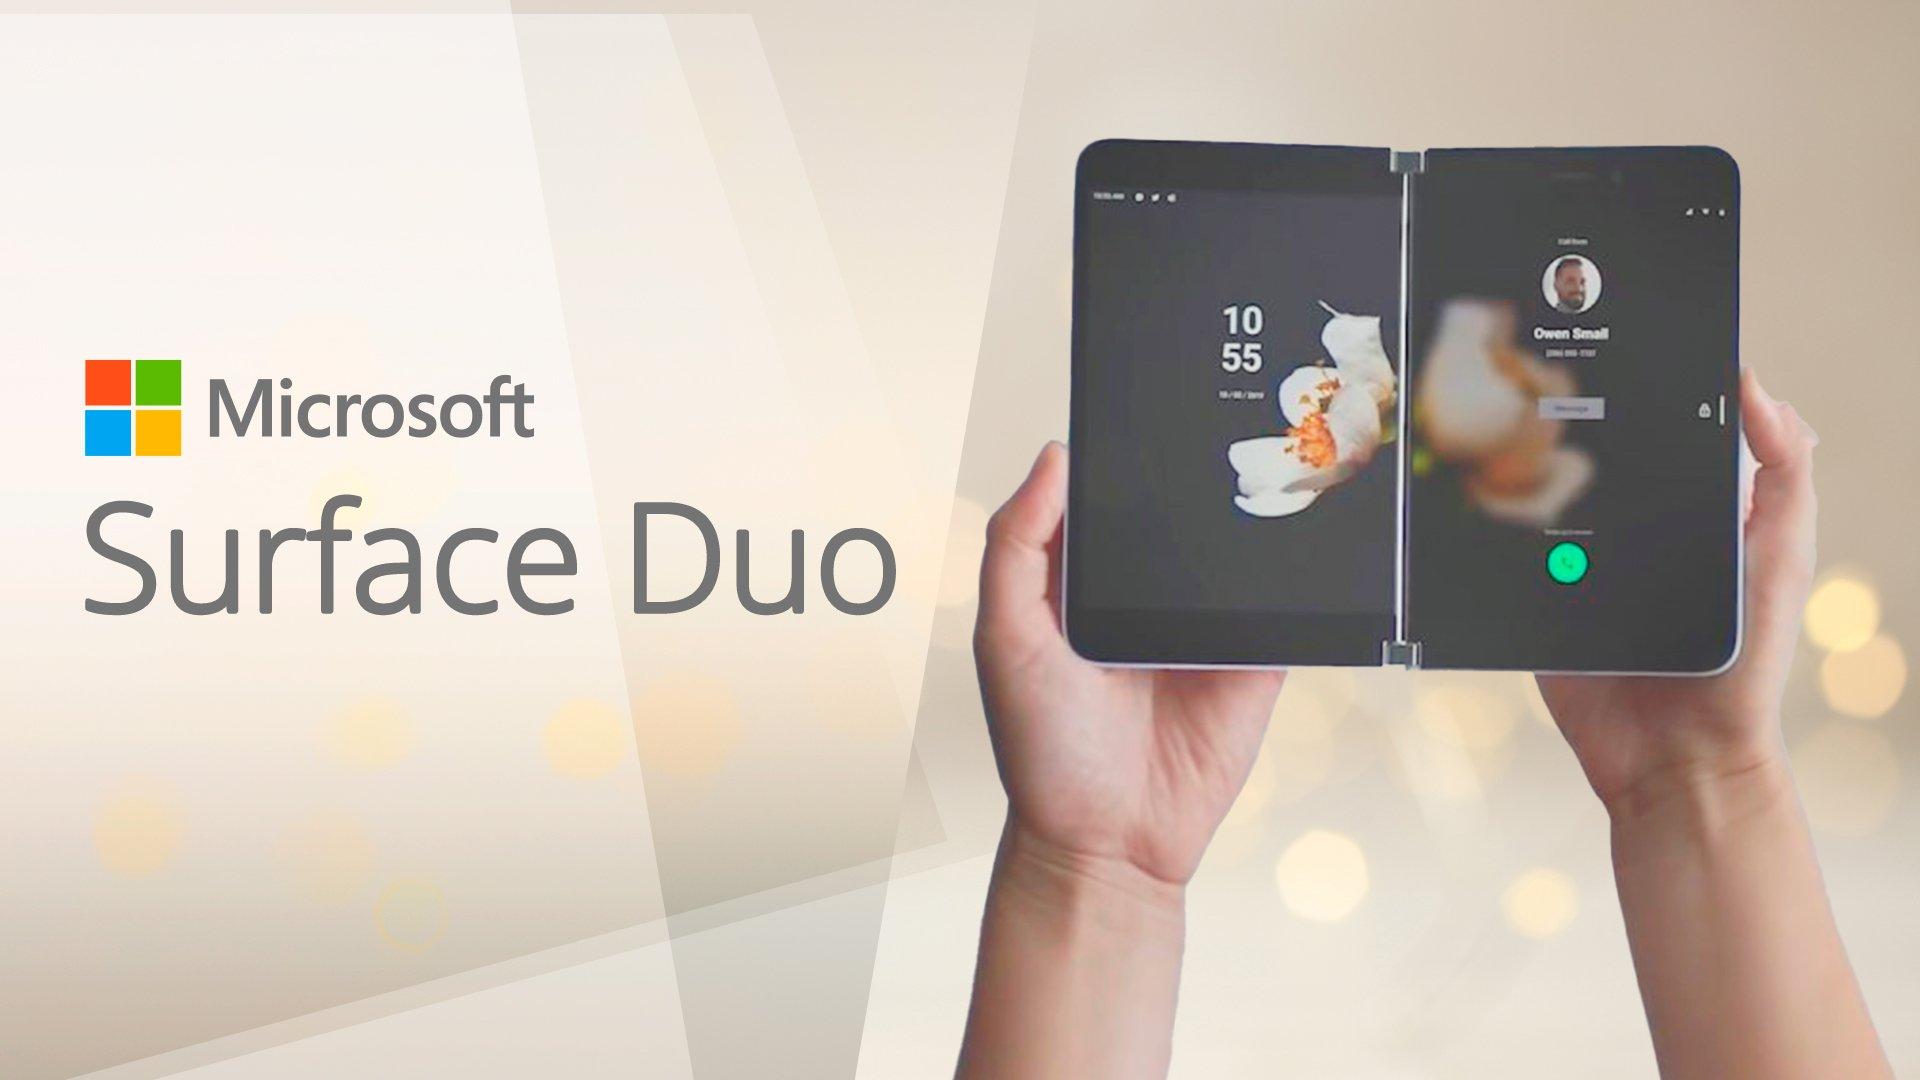 Microsoft, Microsoft Surface, Surface Duo, Microsoft Surface Duo, Duo, Dual-Display, Dual-Bildschirm